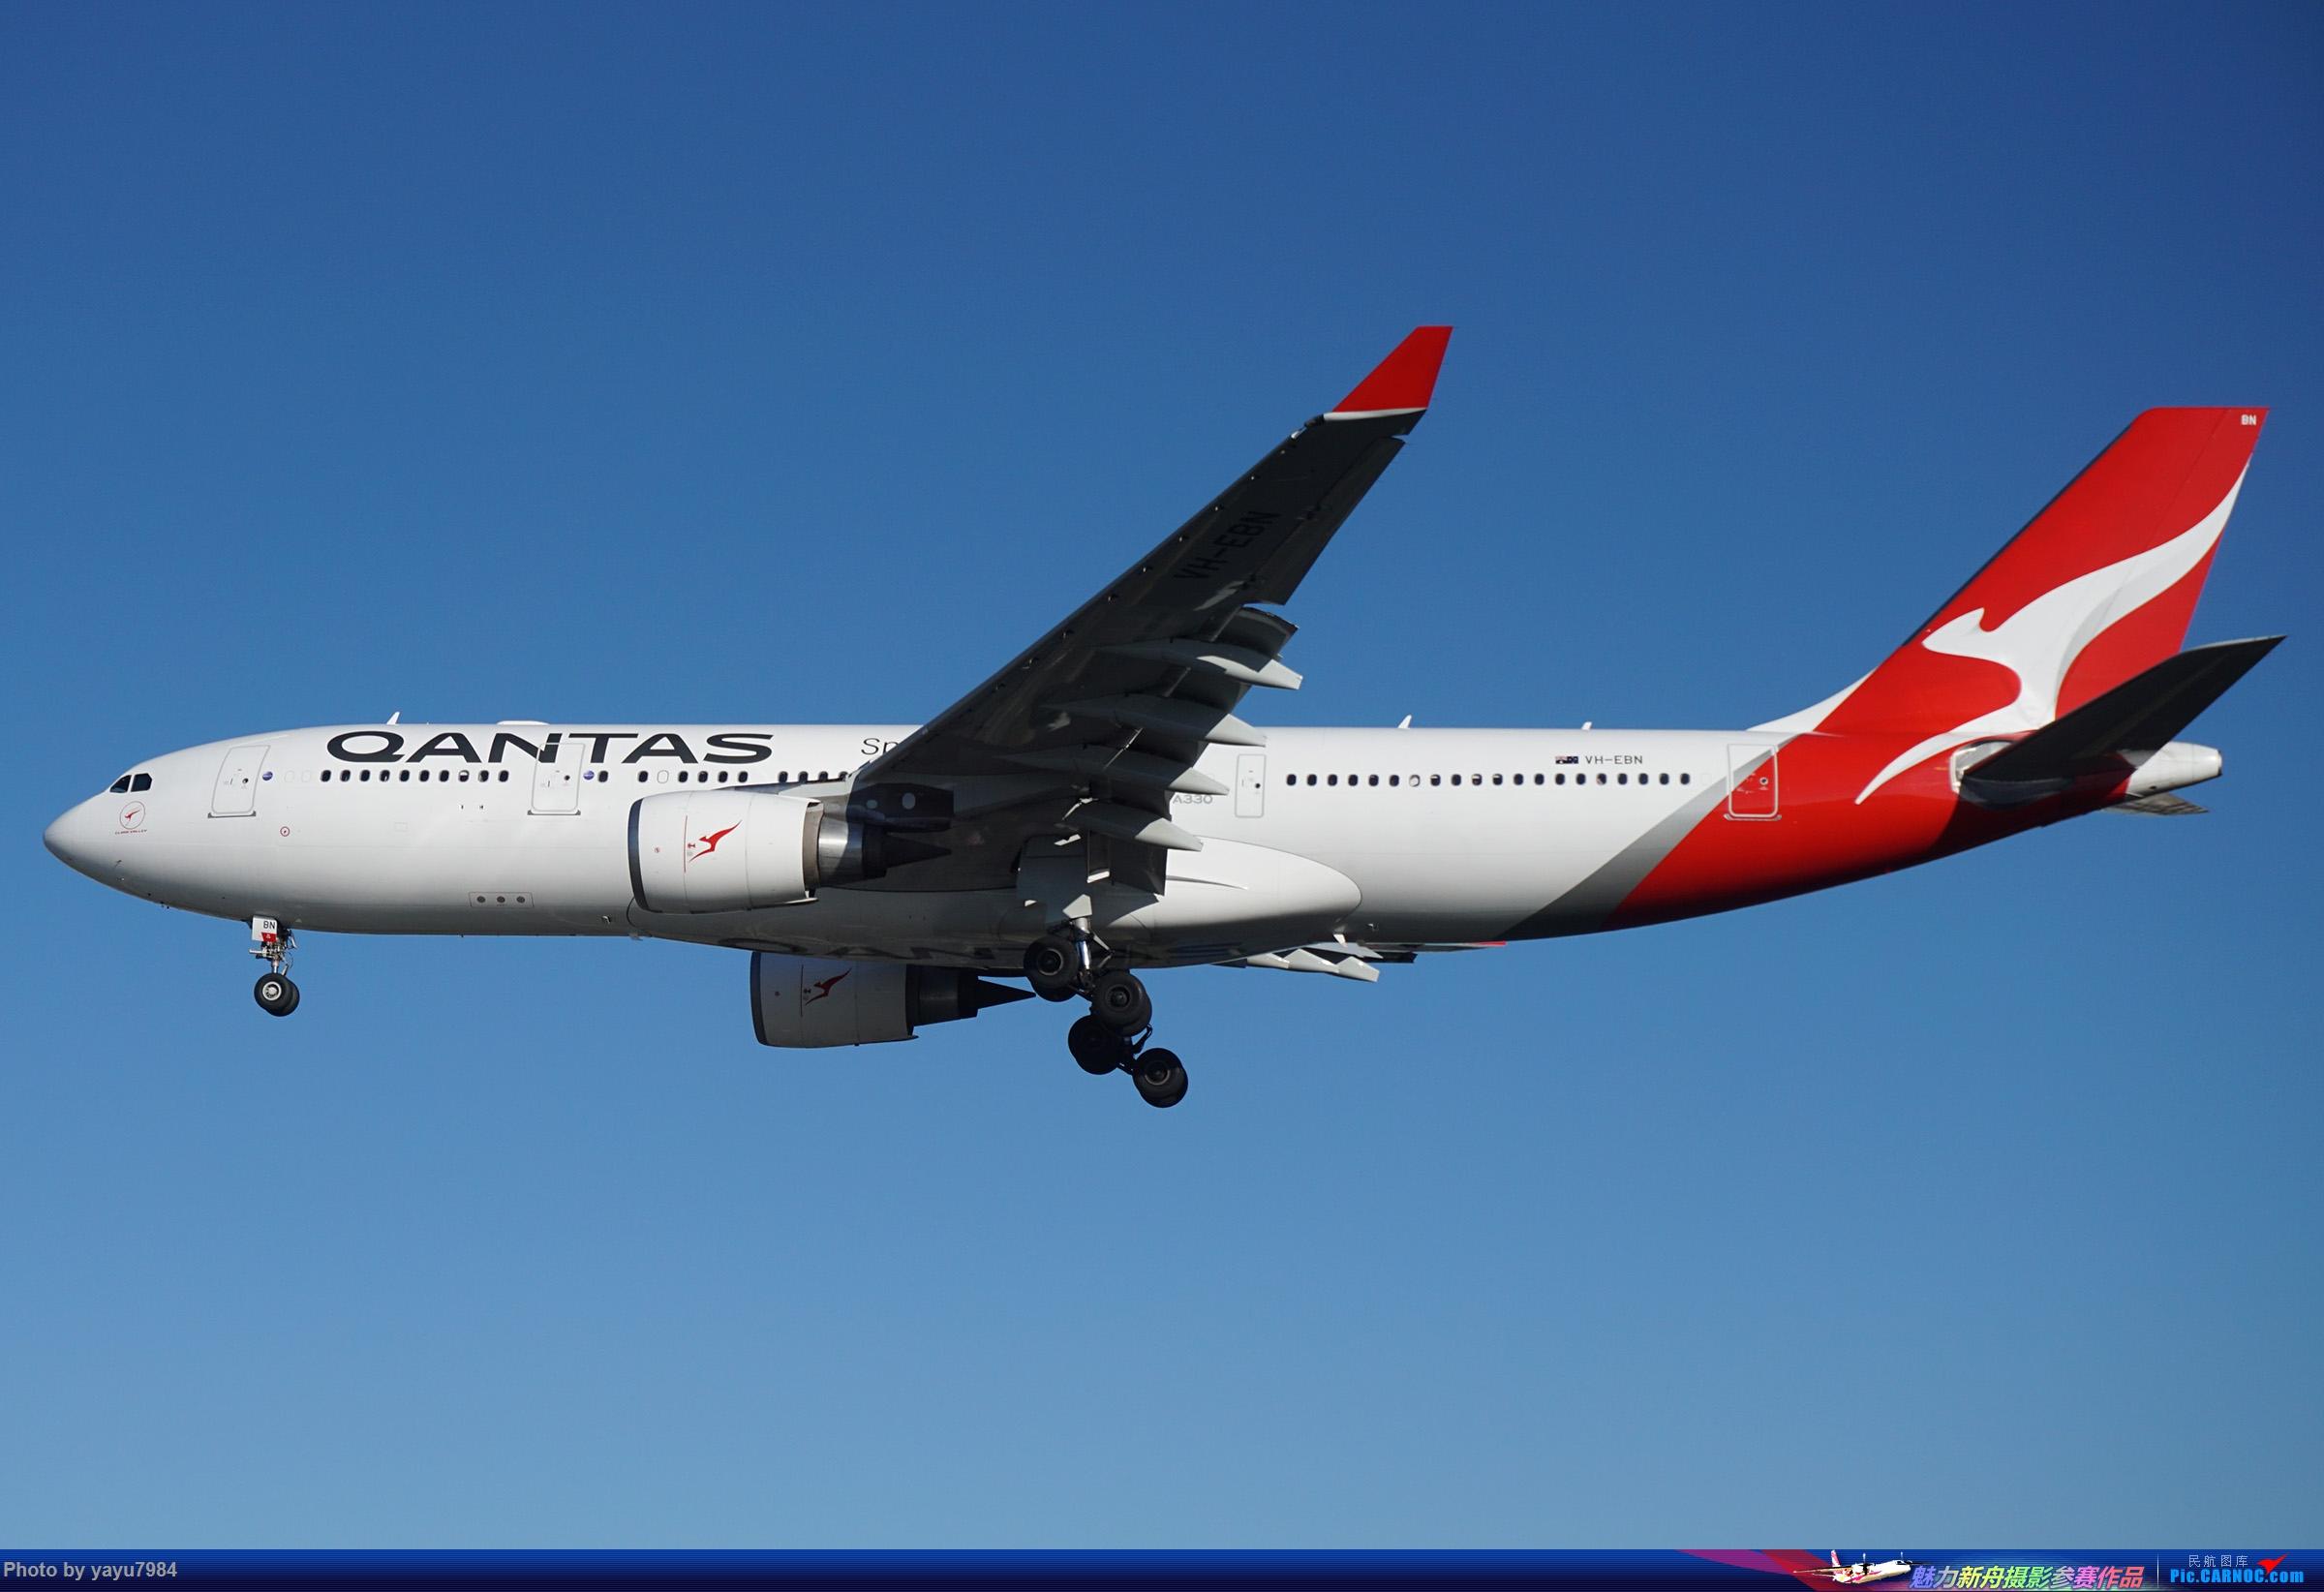 Re:[原创][SYD] 晨悉尼,16R扎堆到达 AIRBUS A330-200 VH-EBN 澳大利亚悉尼金斯福德·史密斯机场